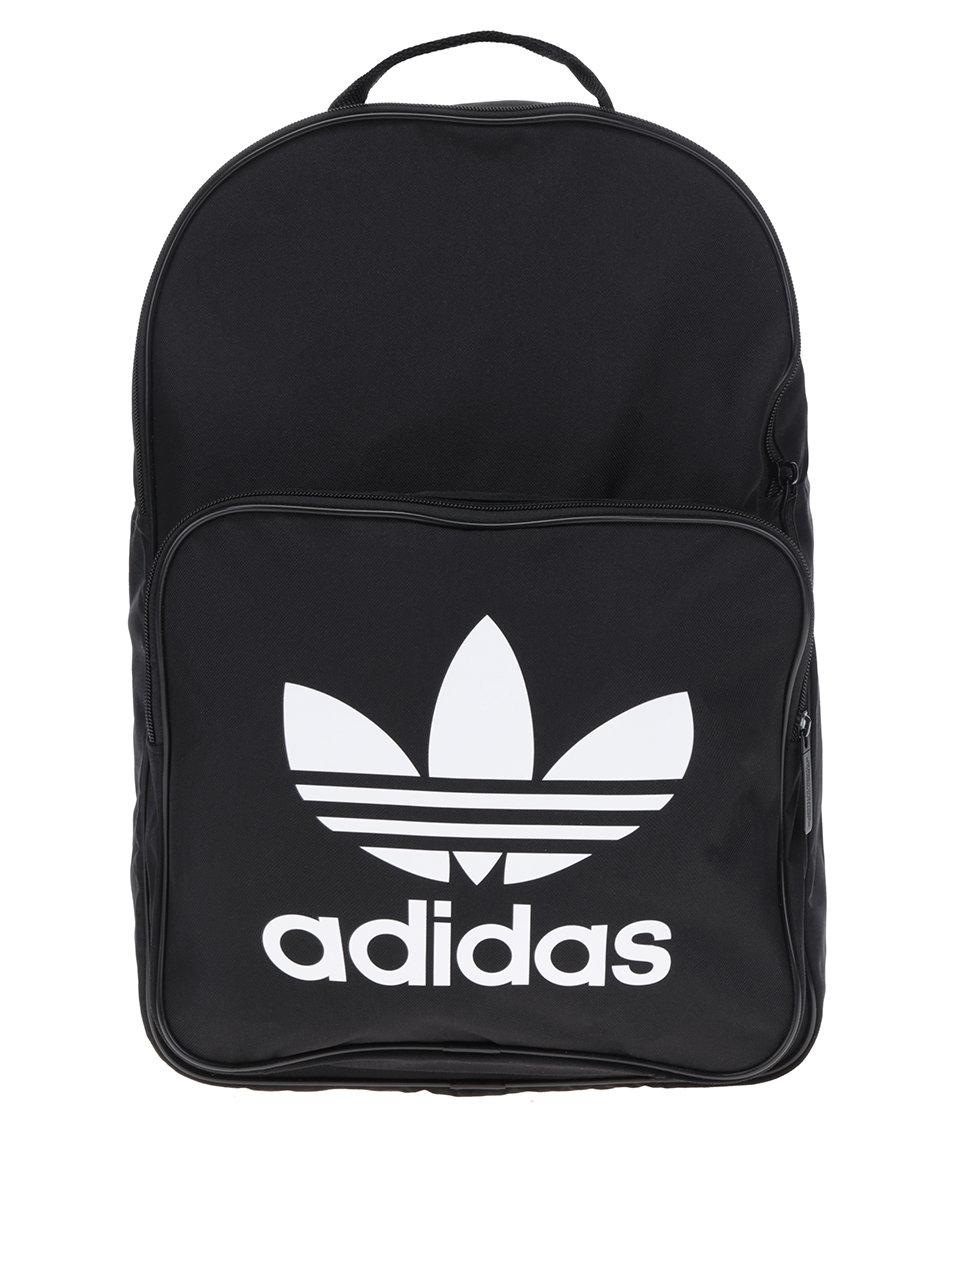 Černý unisex batoh adidas Originals ... 17fdab102c